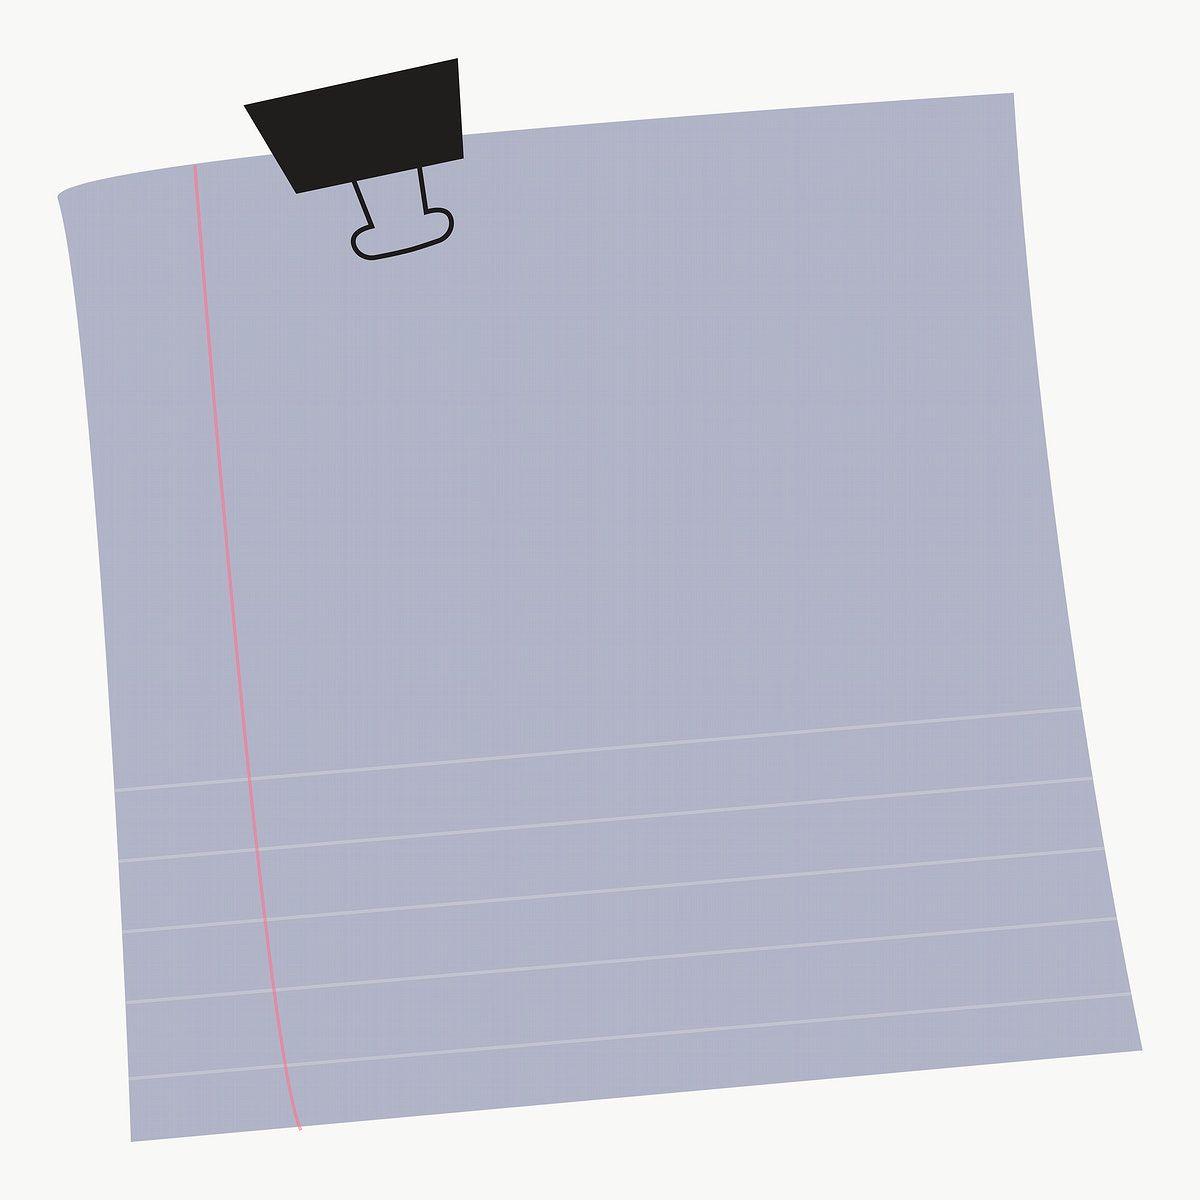 Download Premium Png Of Blank Lined Notepaper Set With Binder Clip On Note Paper Notes Design Doodle Frame